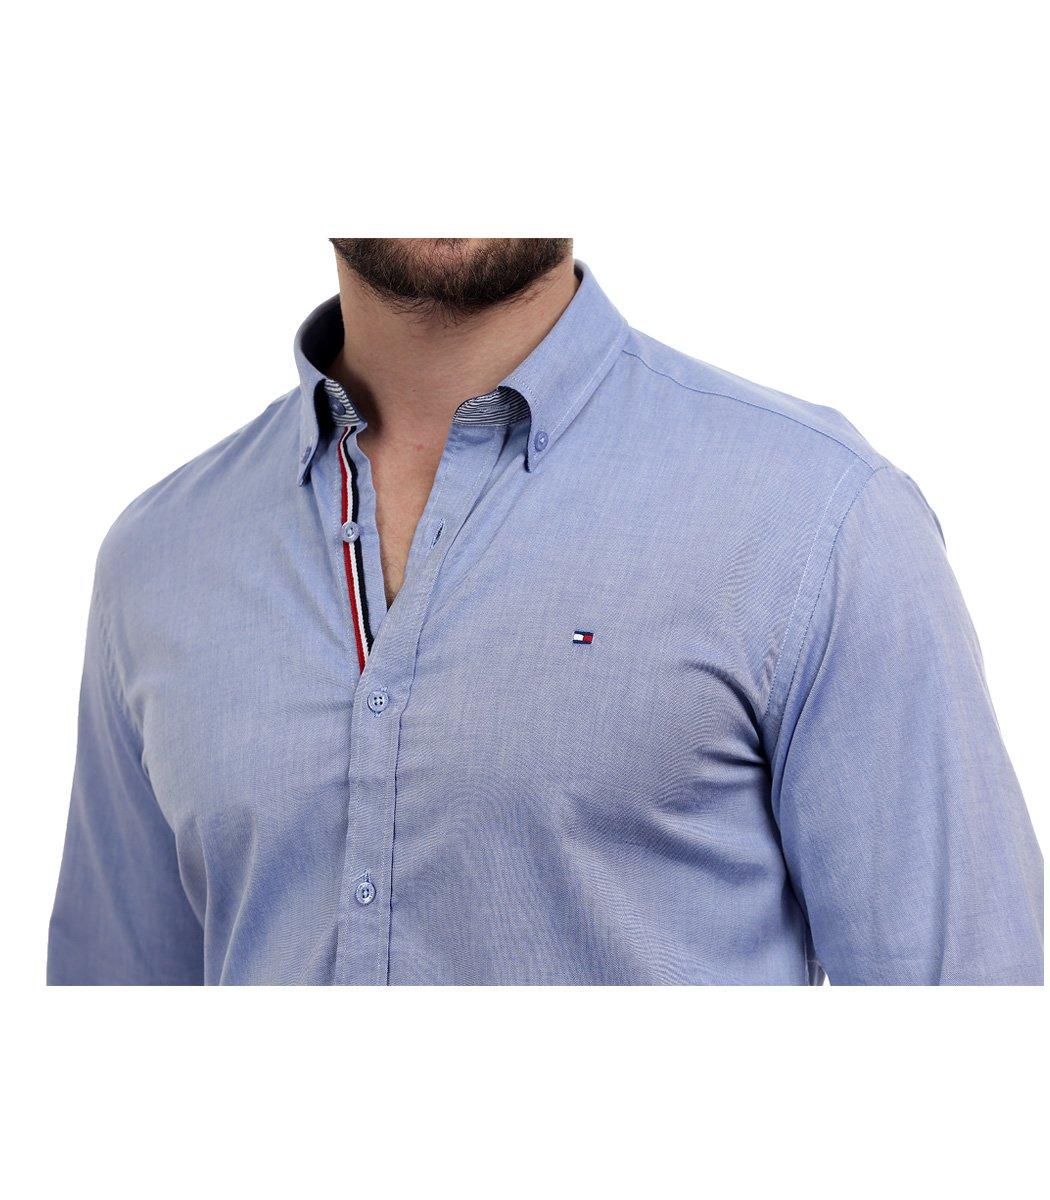 Голубая рубашка Tommy Hilfiger classic - Голубой - Вид 6